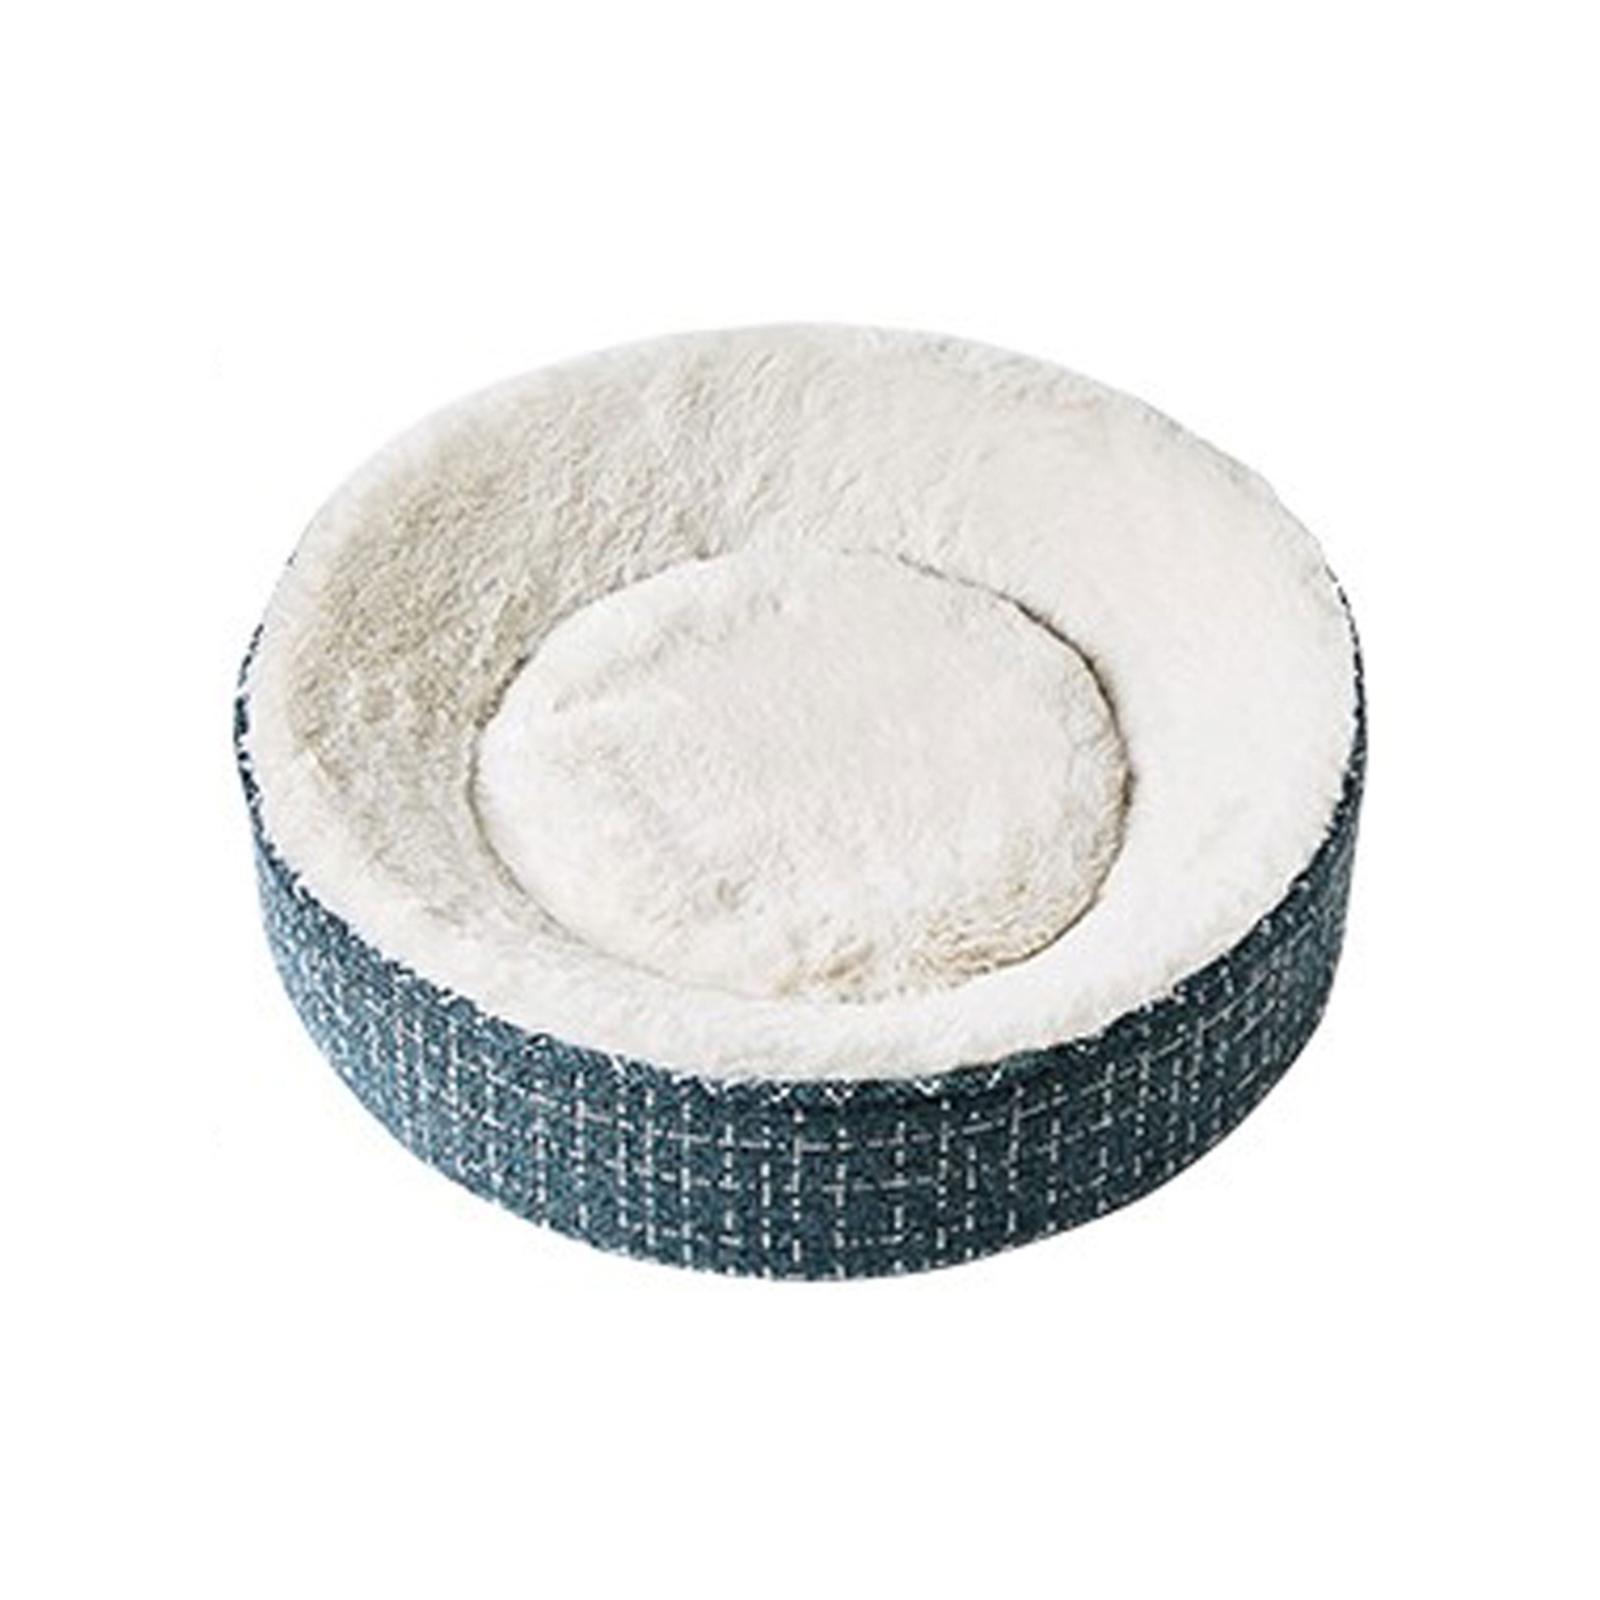 Petkit Deep Sleep 41cm Cat/Kitten/Pet Memory Foam Curved/Round Bed Warm/Cozy BLU